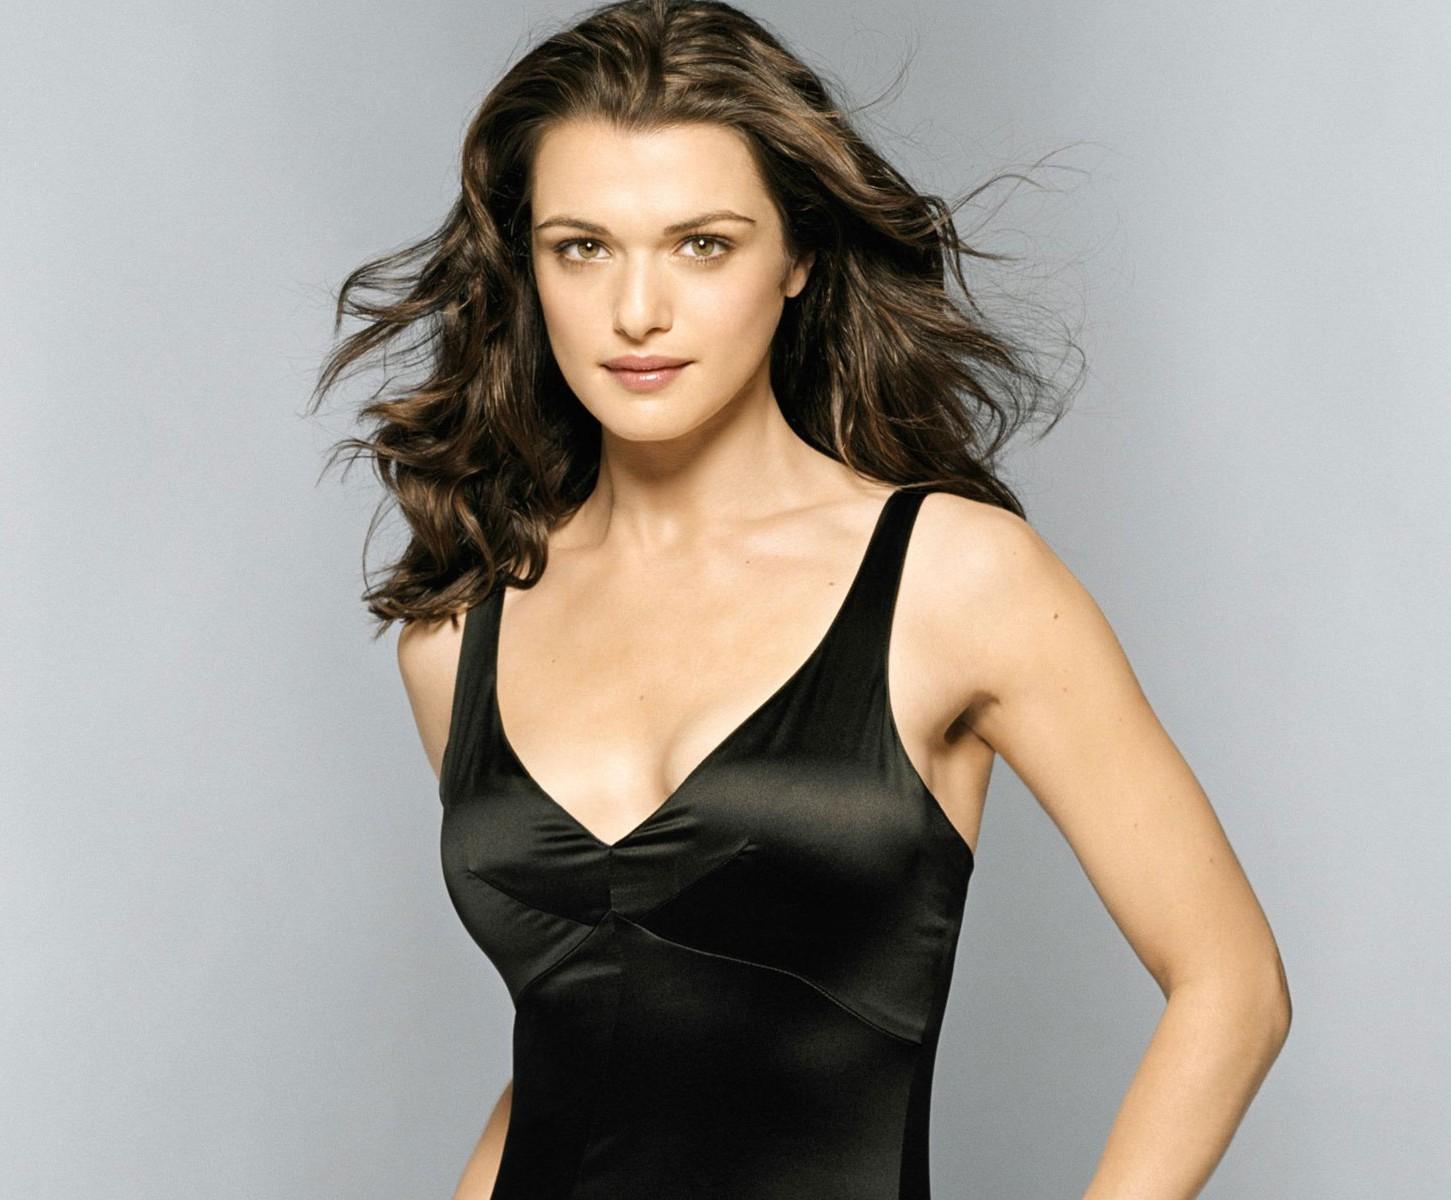 Free Beauty Pictures: Alia Shawkat American actresses hot